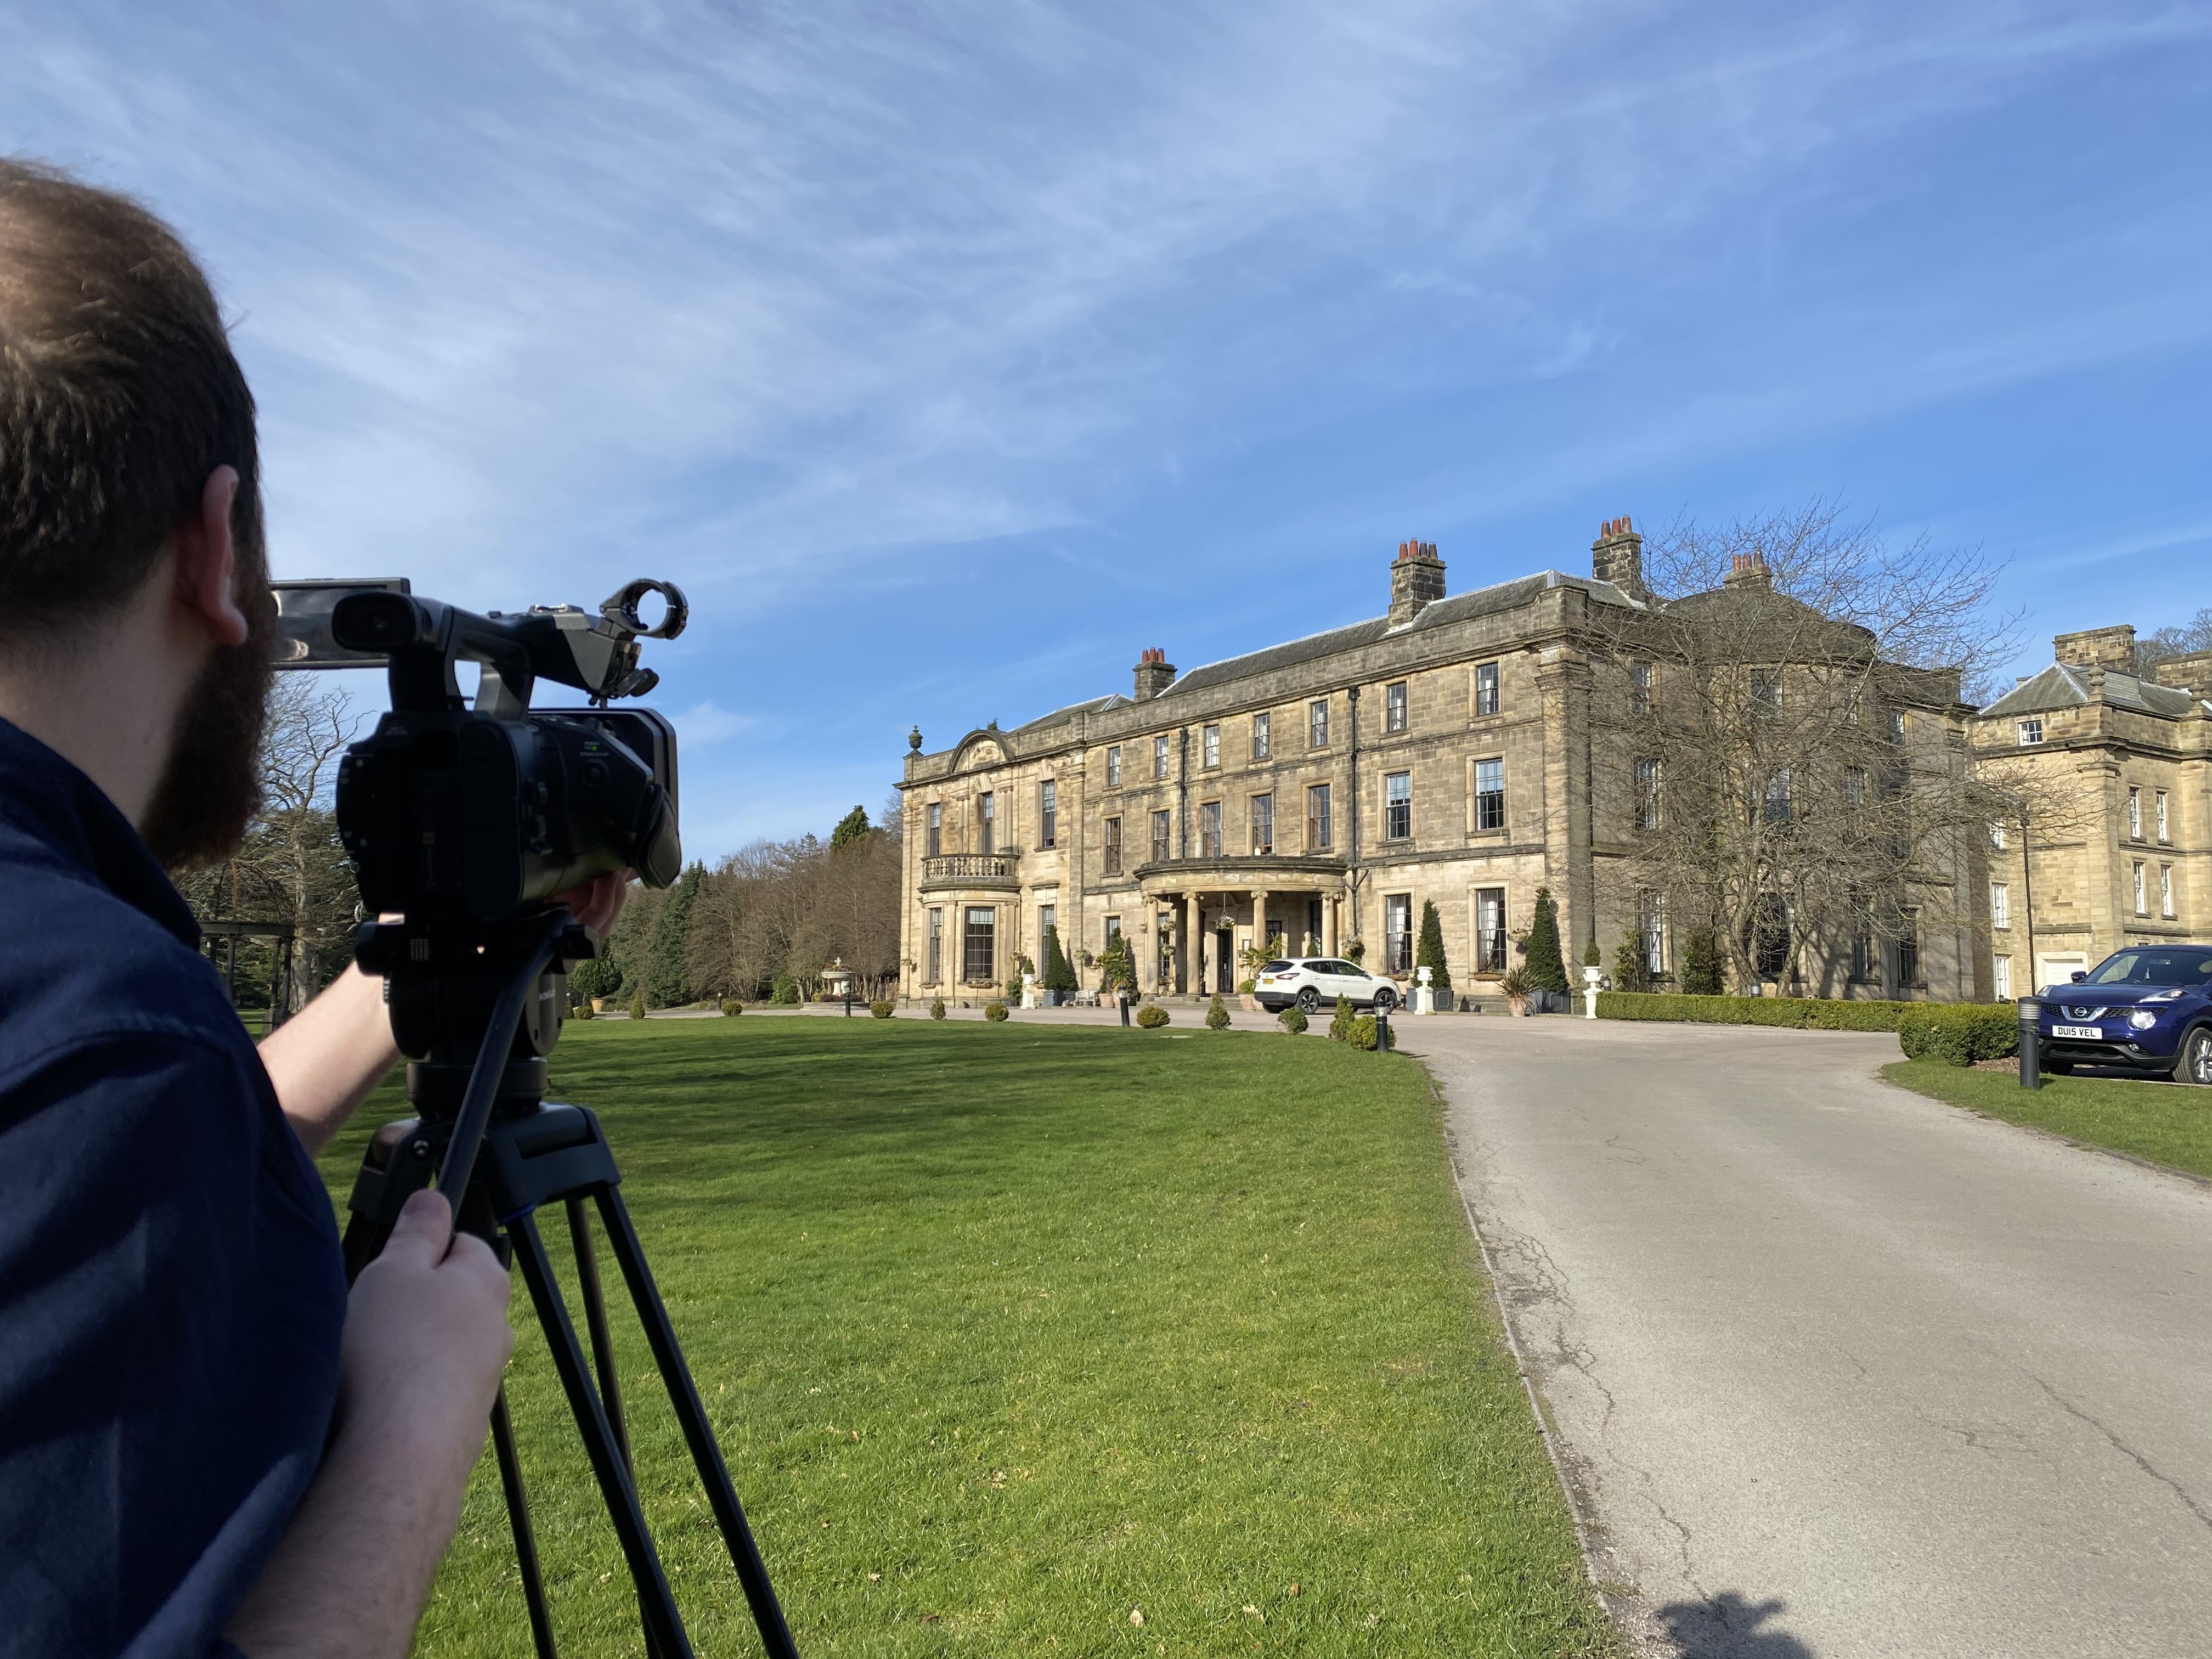 Beamish Hall wedding - the exterior of Beamish Hall